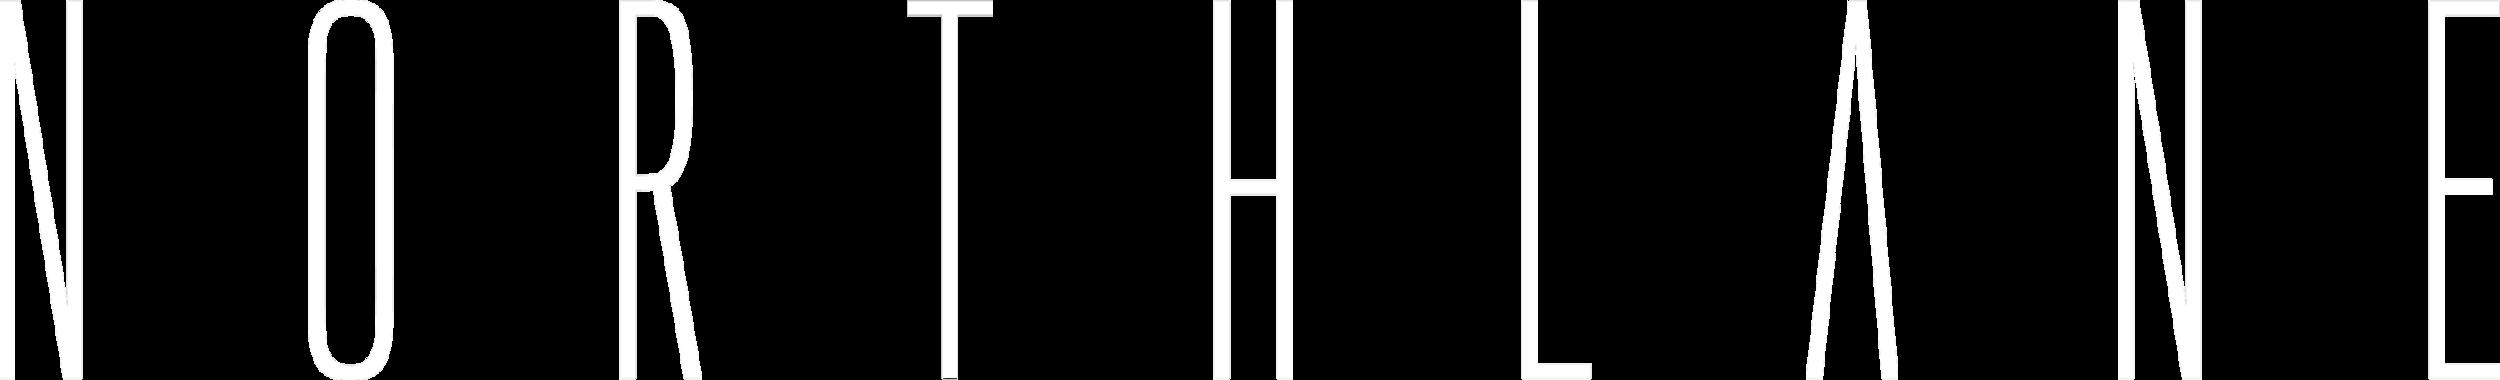 northlane_logo.png